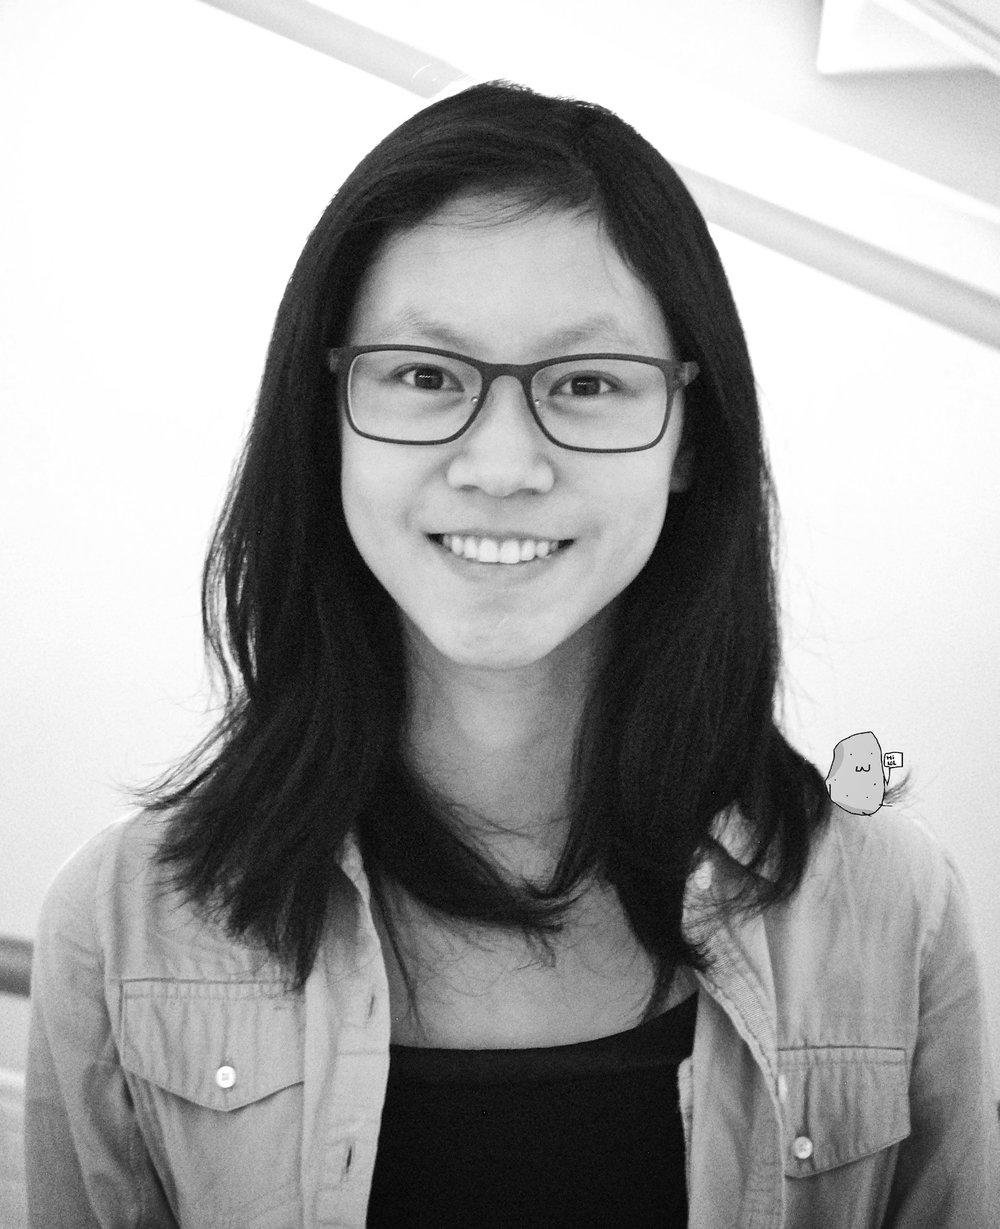 kimberly hoi  |  graduate student, bms program